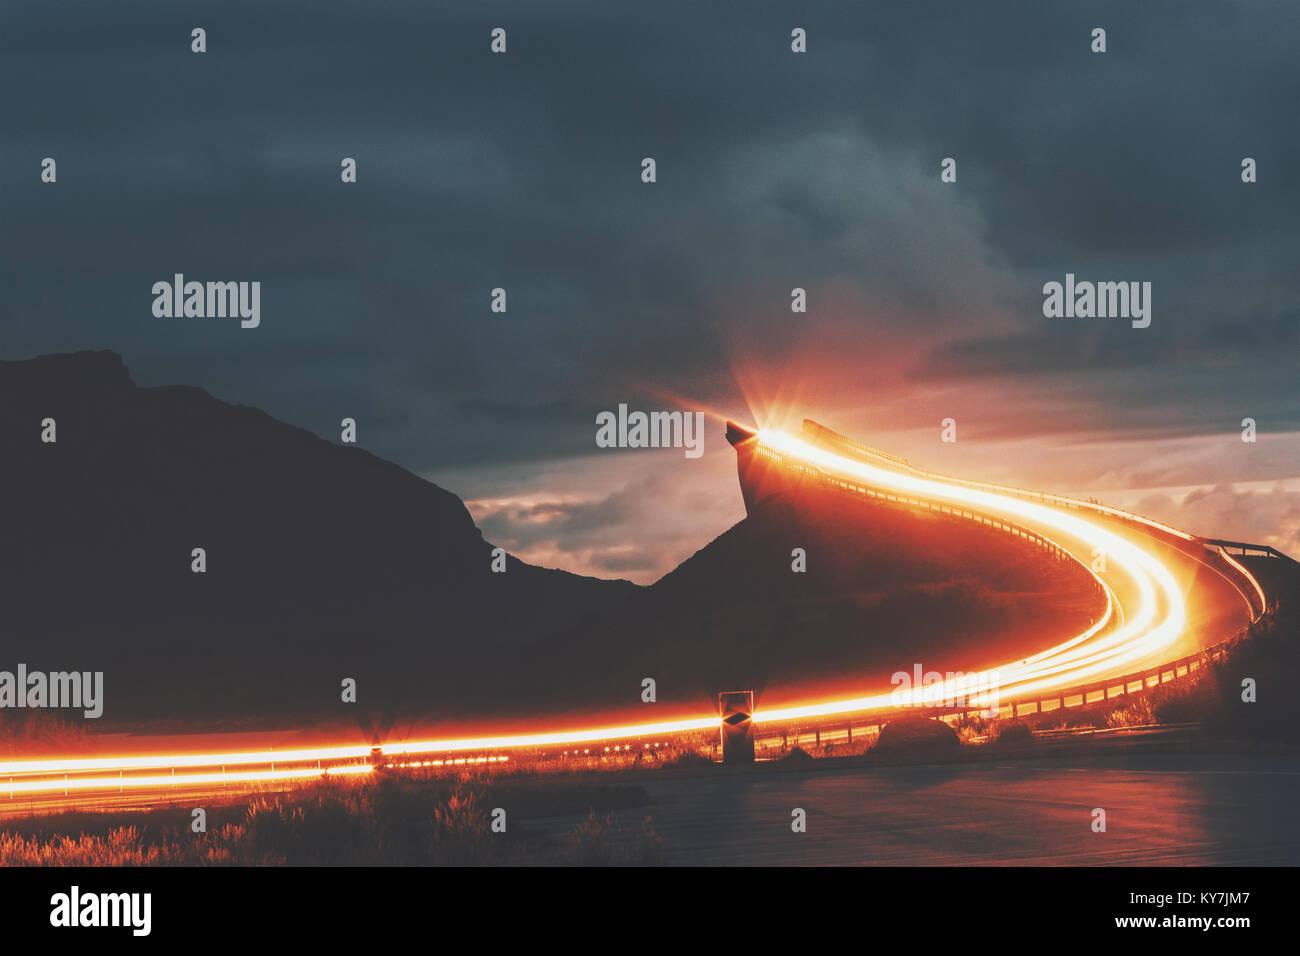 Atlantic road in Norvegia notte Storseisundet ponte su Ocean Way to sky viaggi scandinava i punti di riferimento Immagini Stock